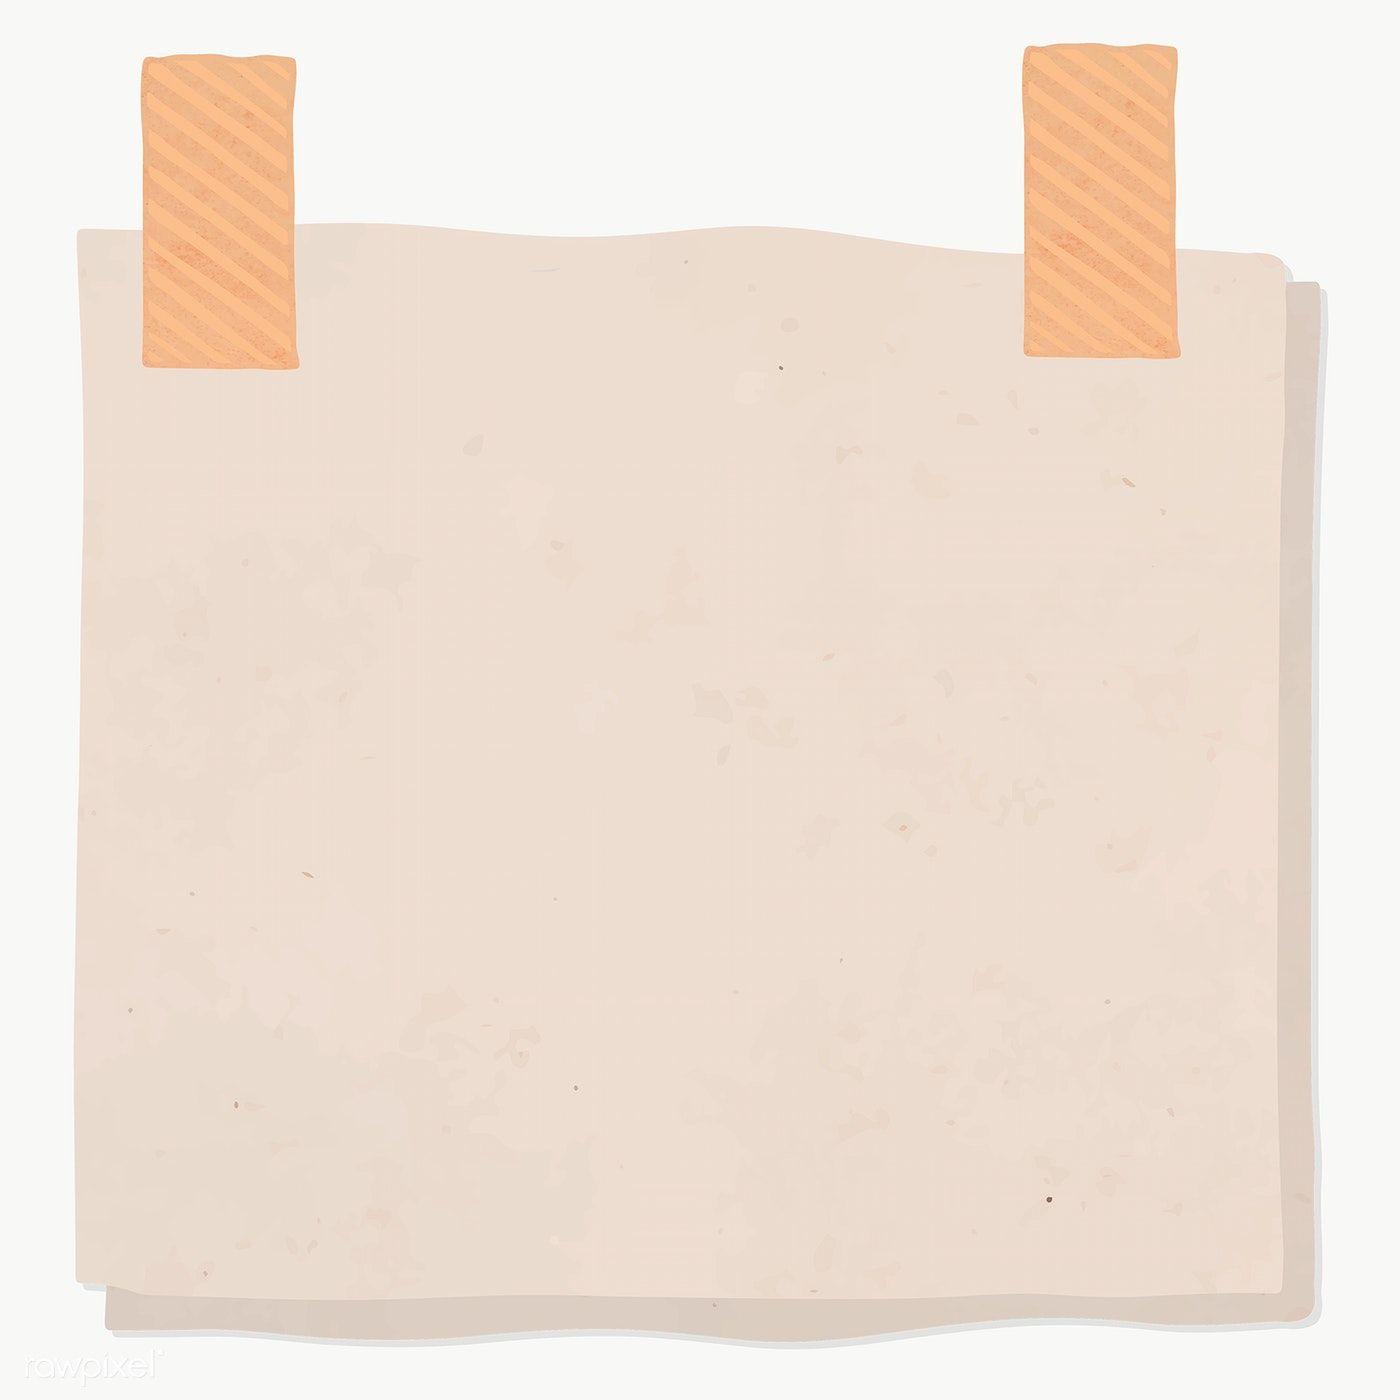 Blank Reminder Paper Note Transparent Png Premium Image By Rawpixel Com Sasi Libre De Vectores Fondos Para Textos Cuadro De Texto